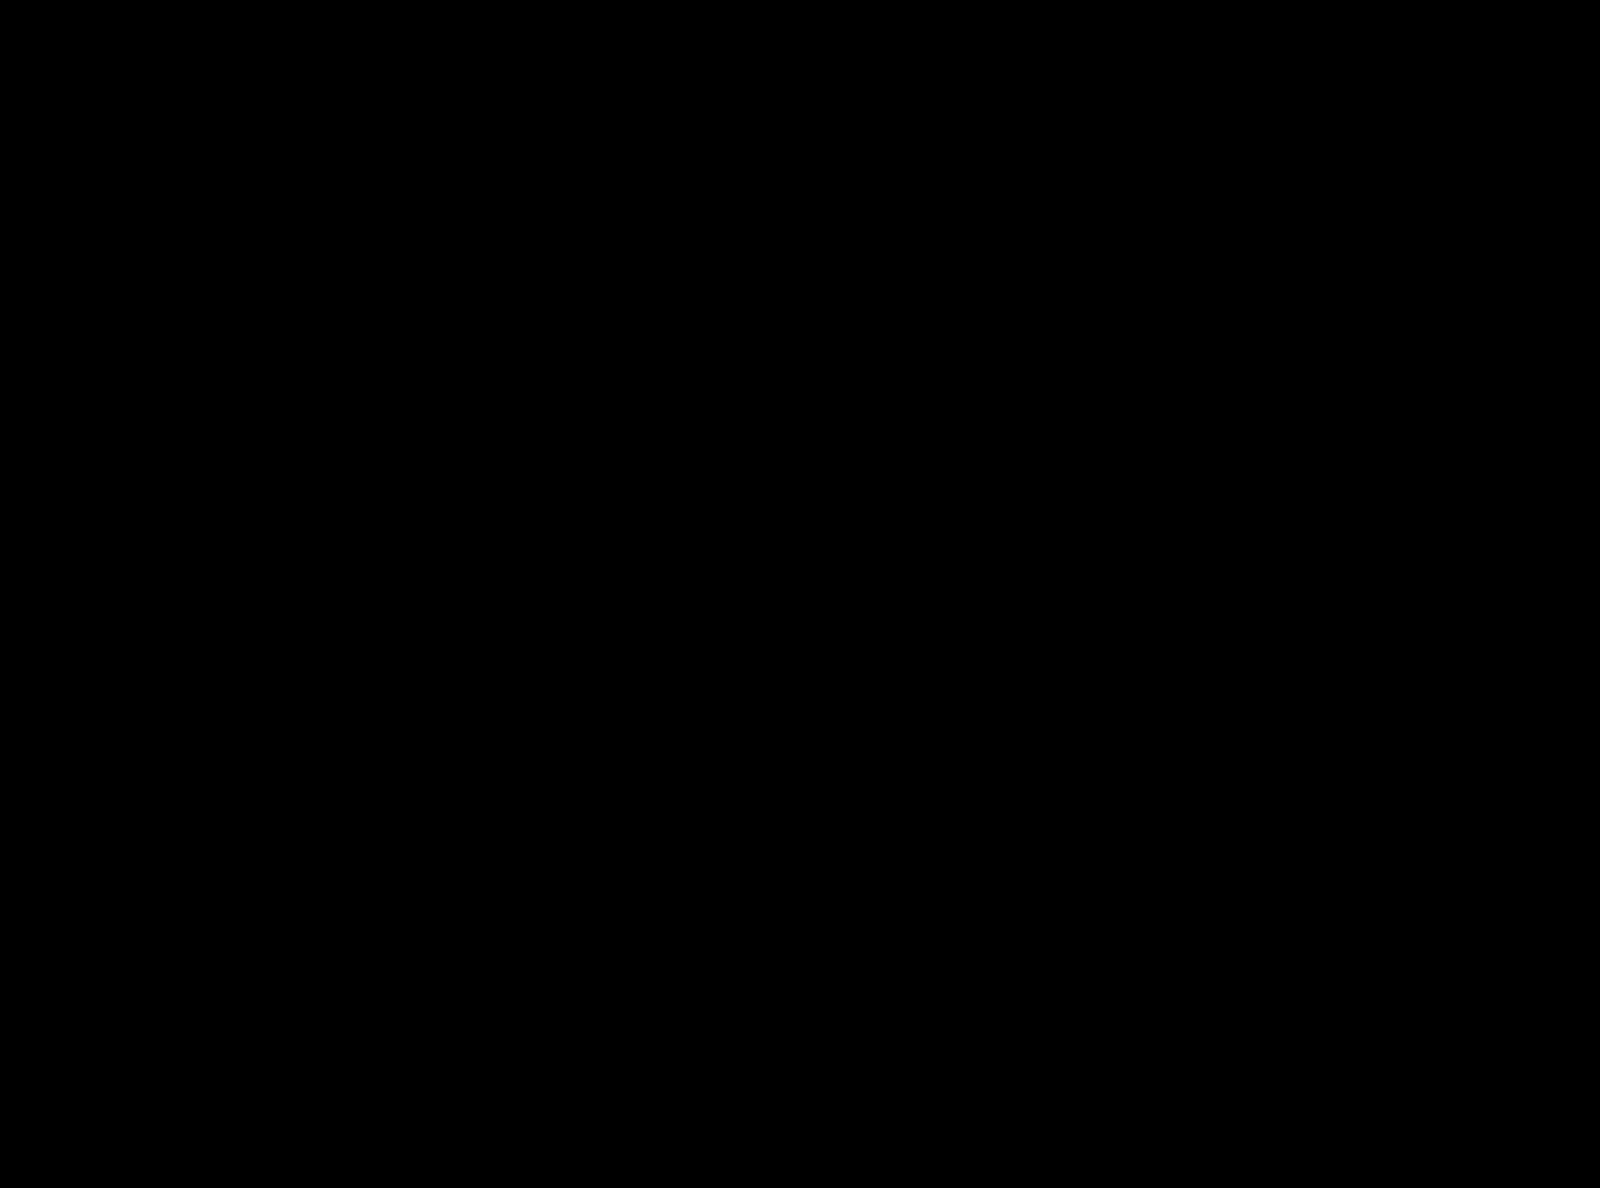 House stark clipart clip transparent Novembro 2014 | Livros & Chantilly | Laser | Pinterest | Cricut ... clip transparent